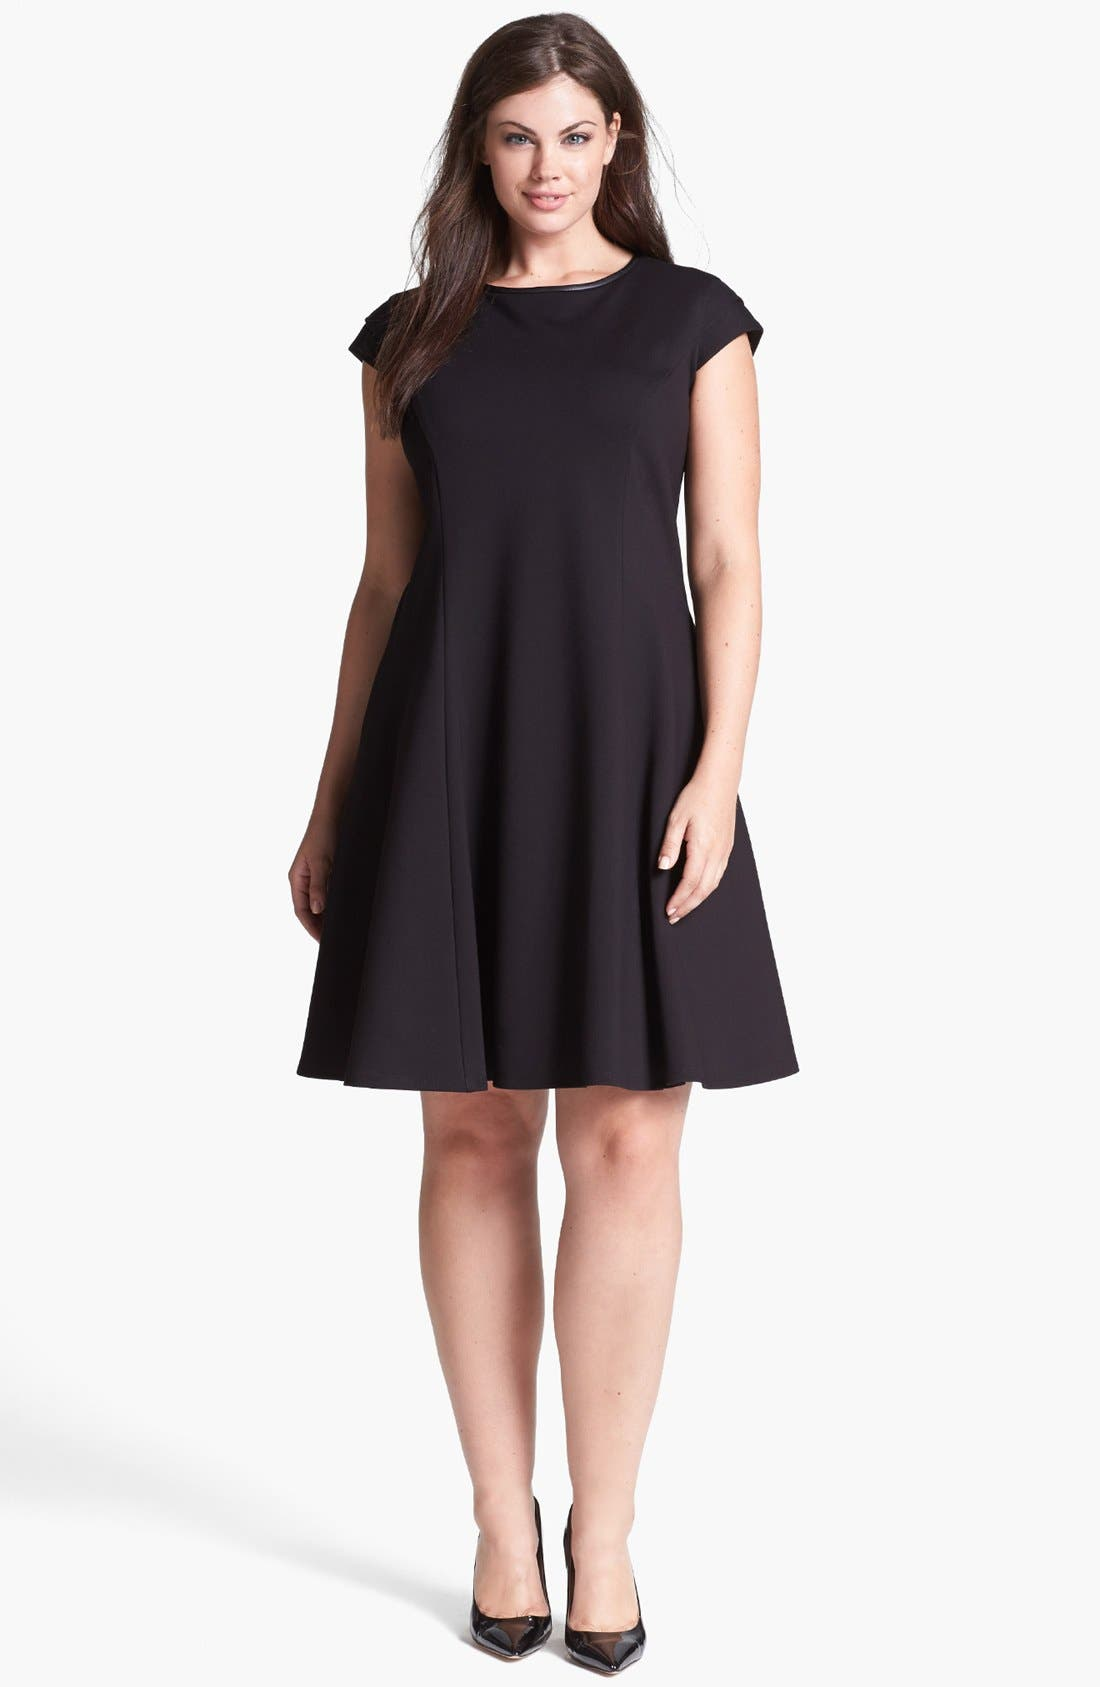 Main Image - ABS by Allen Schwartz Ponte Knit Fit & Flare Dress (Plus Size)